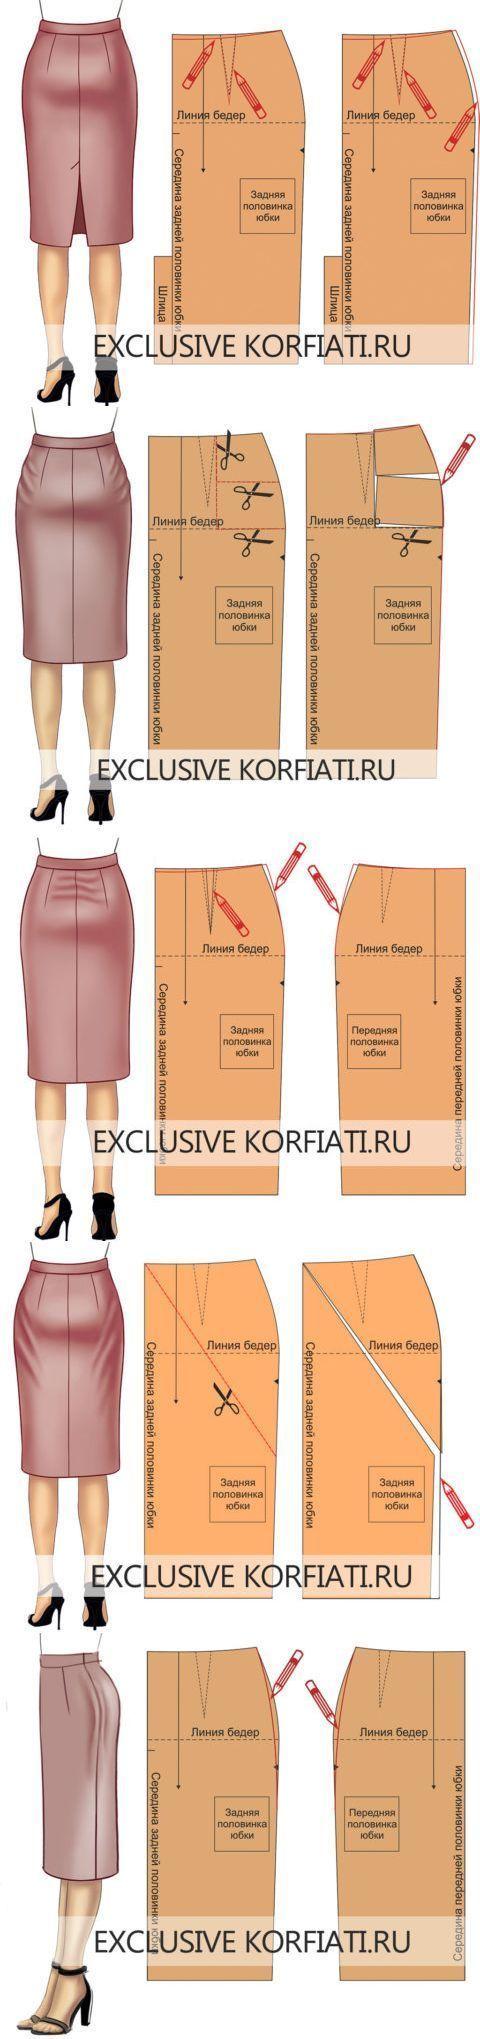 http://korfiati.ru fixing skirt fitting issues on the pattern